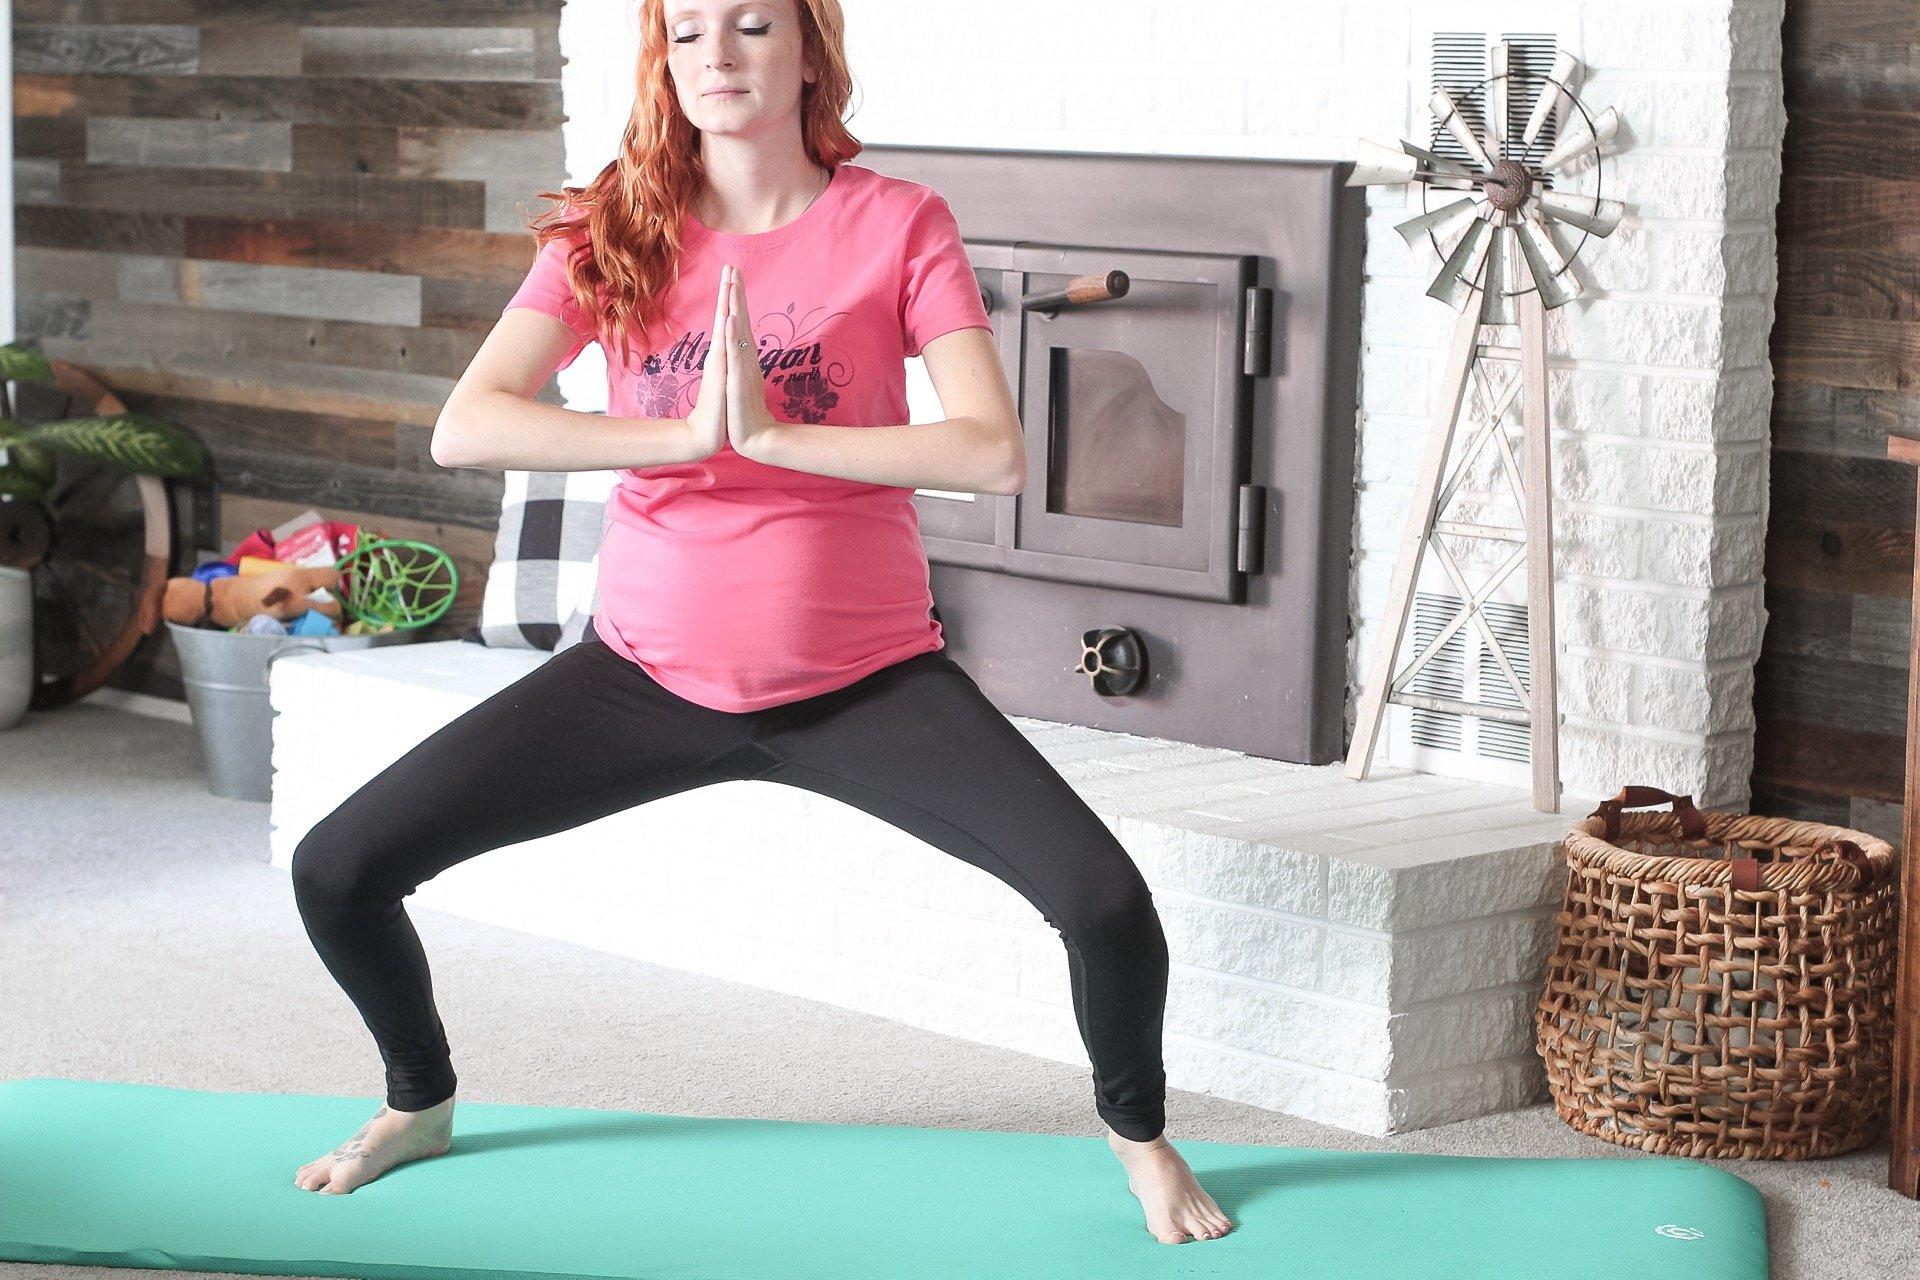 prenatal yoga poses sumo squat pose